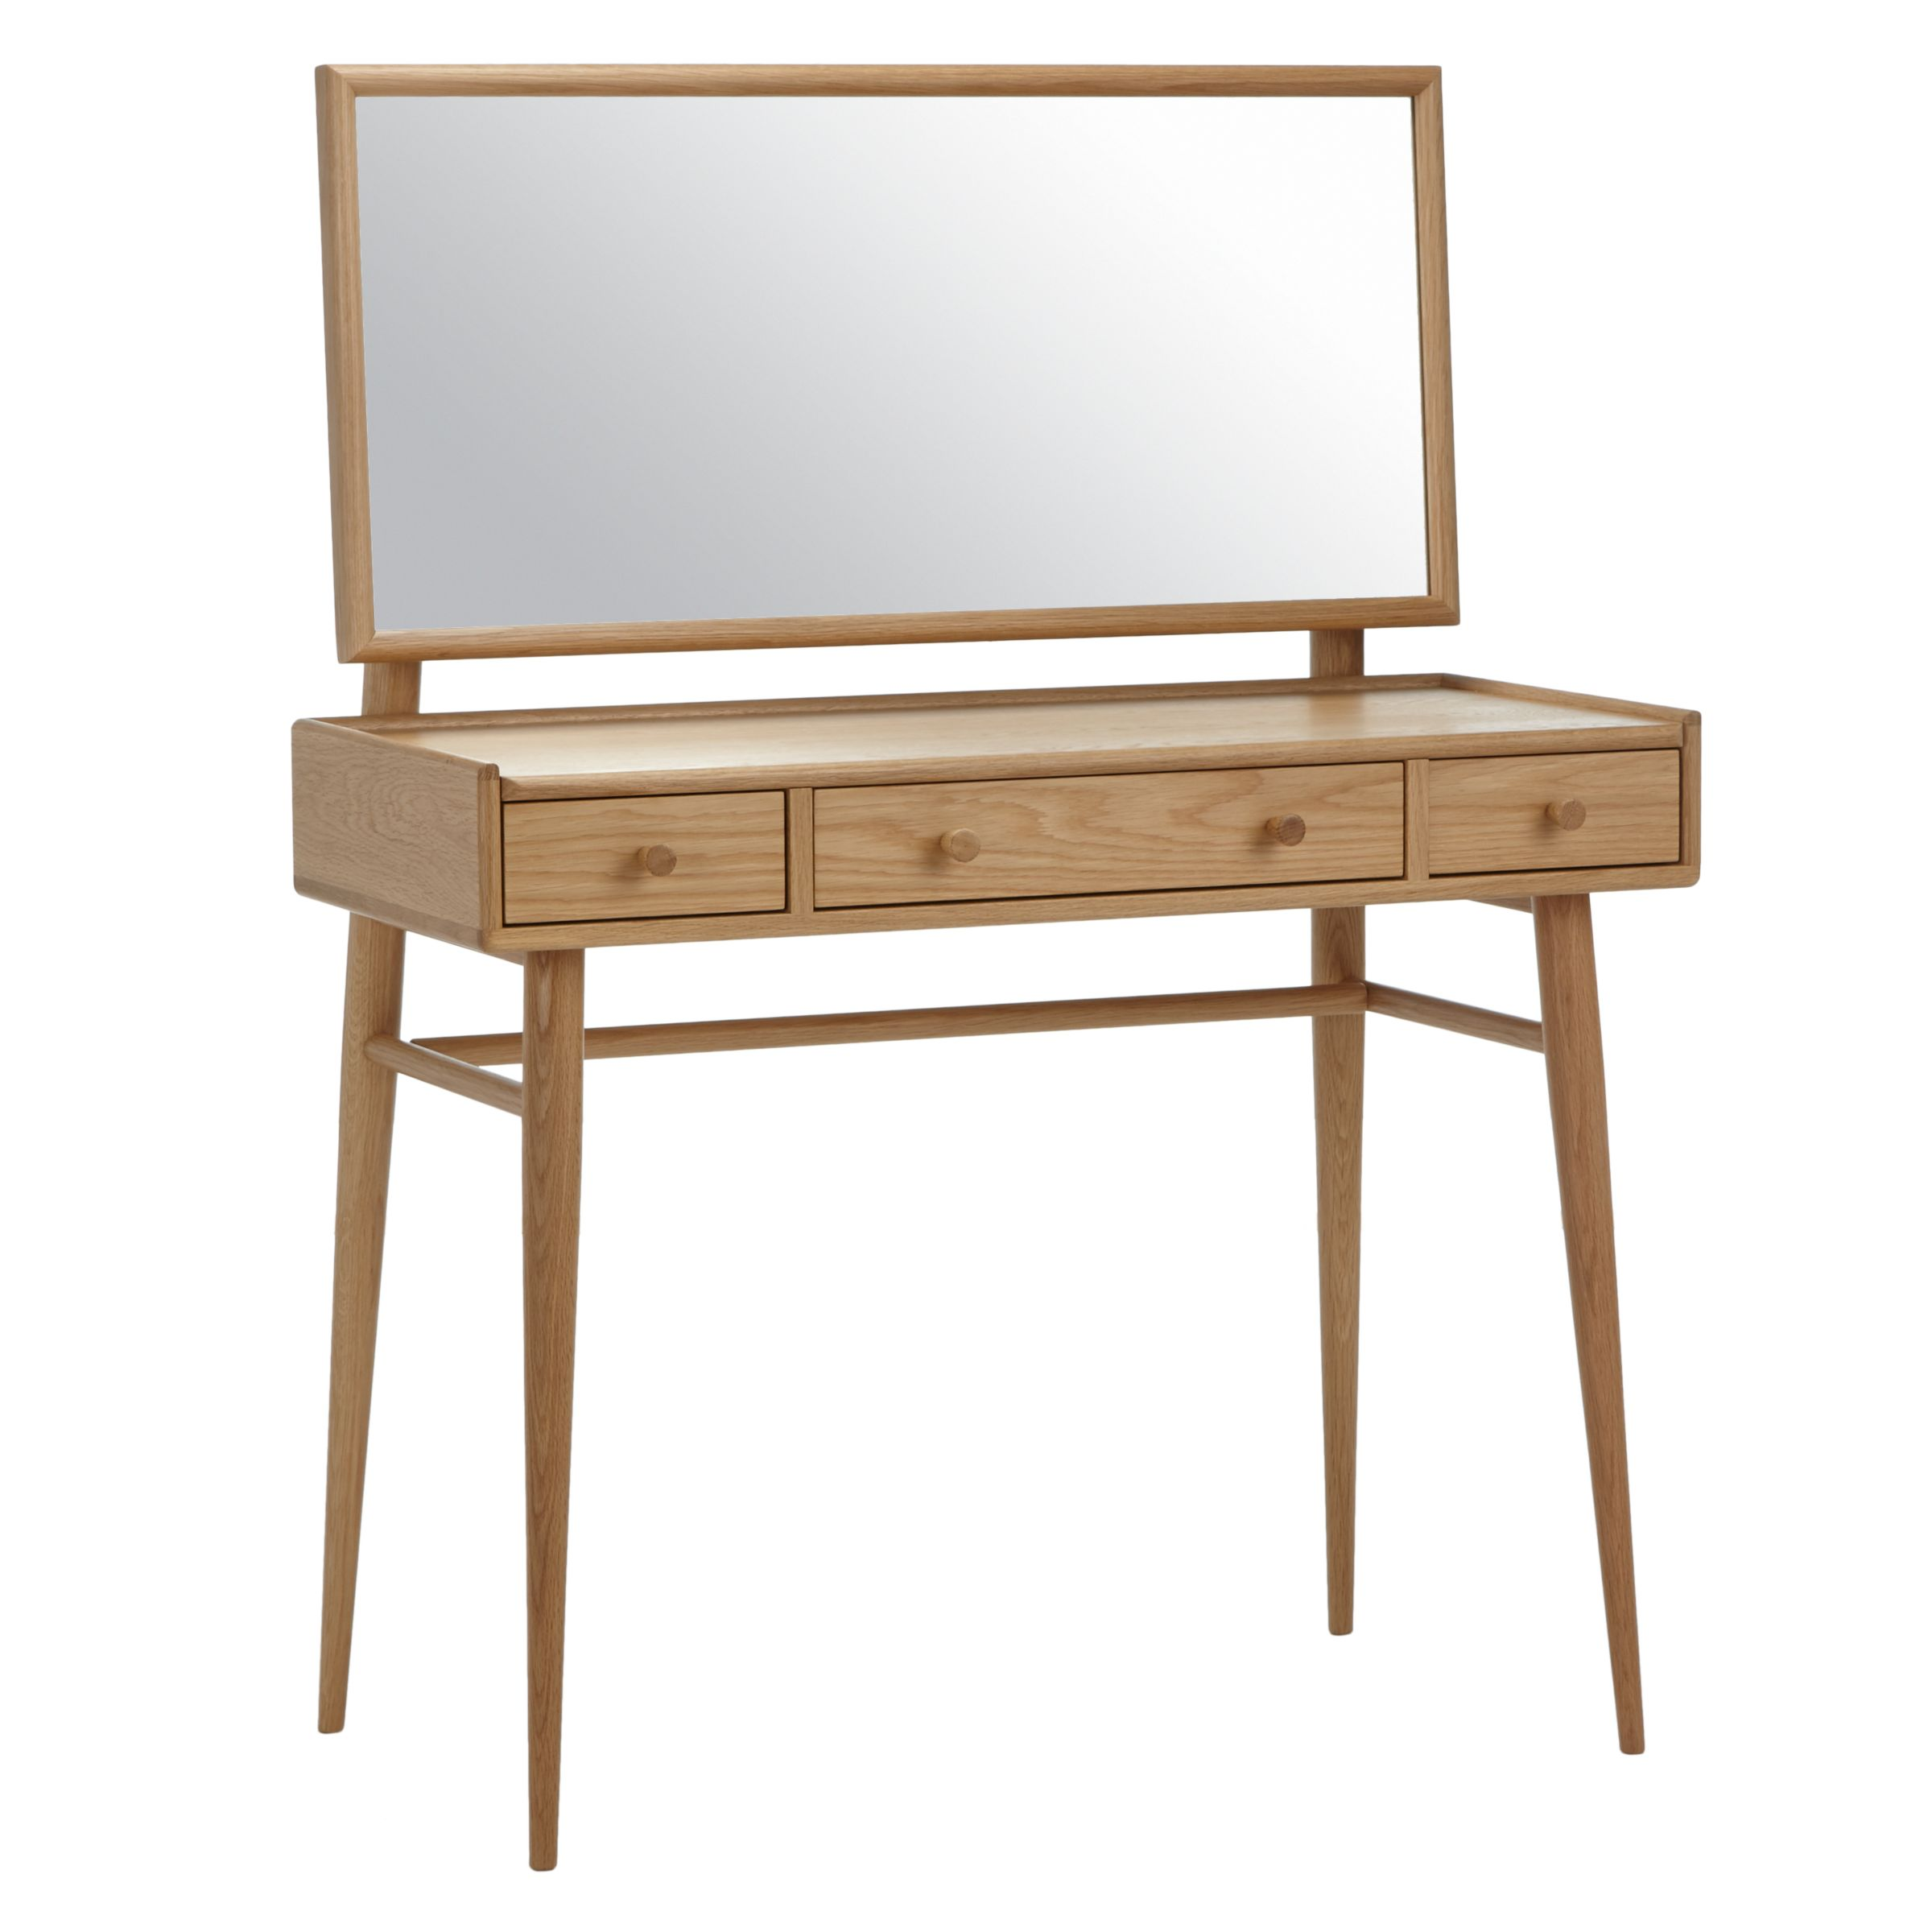 Buy Ercol For John Lewis Shalstone Dressing Table John Lewis